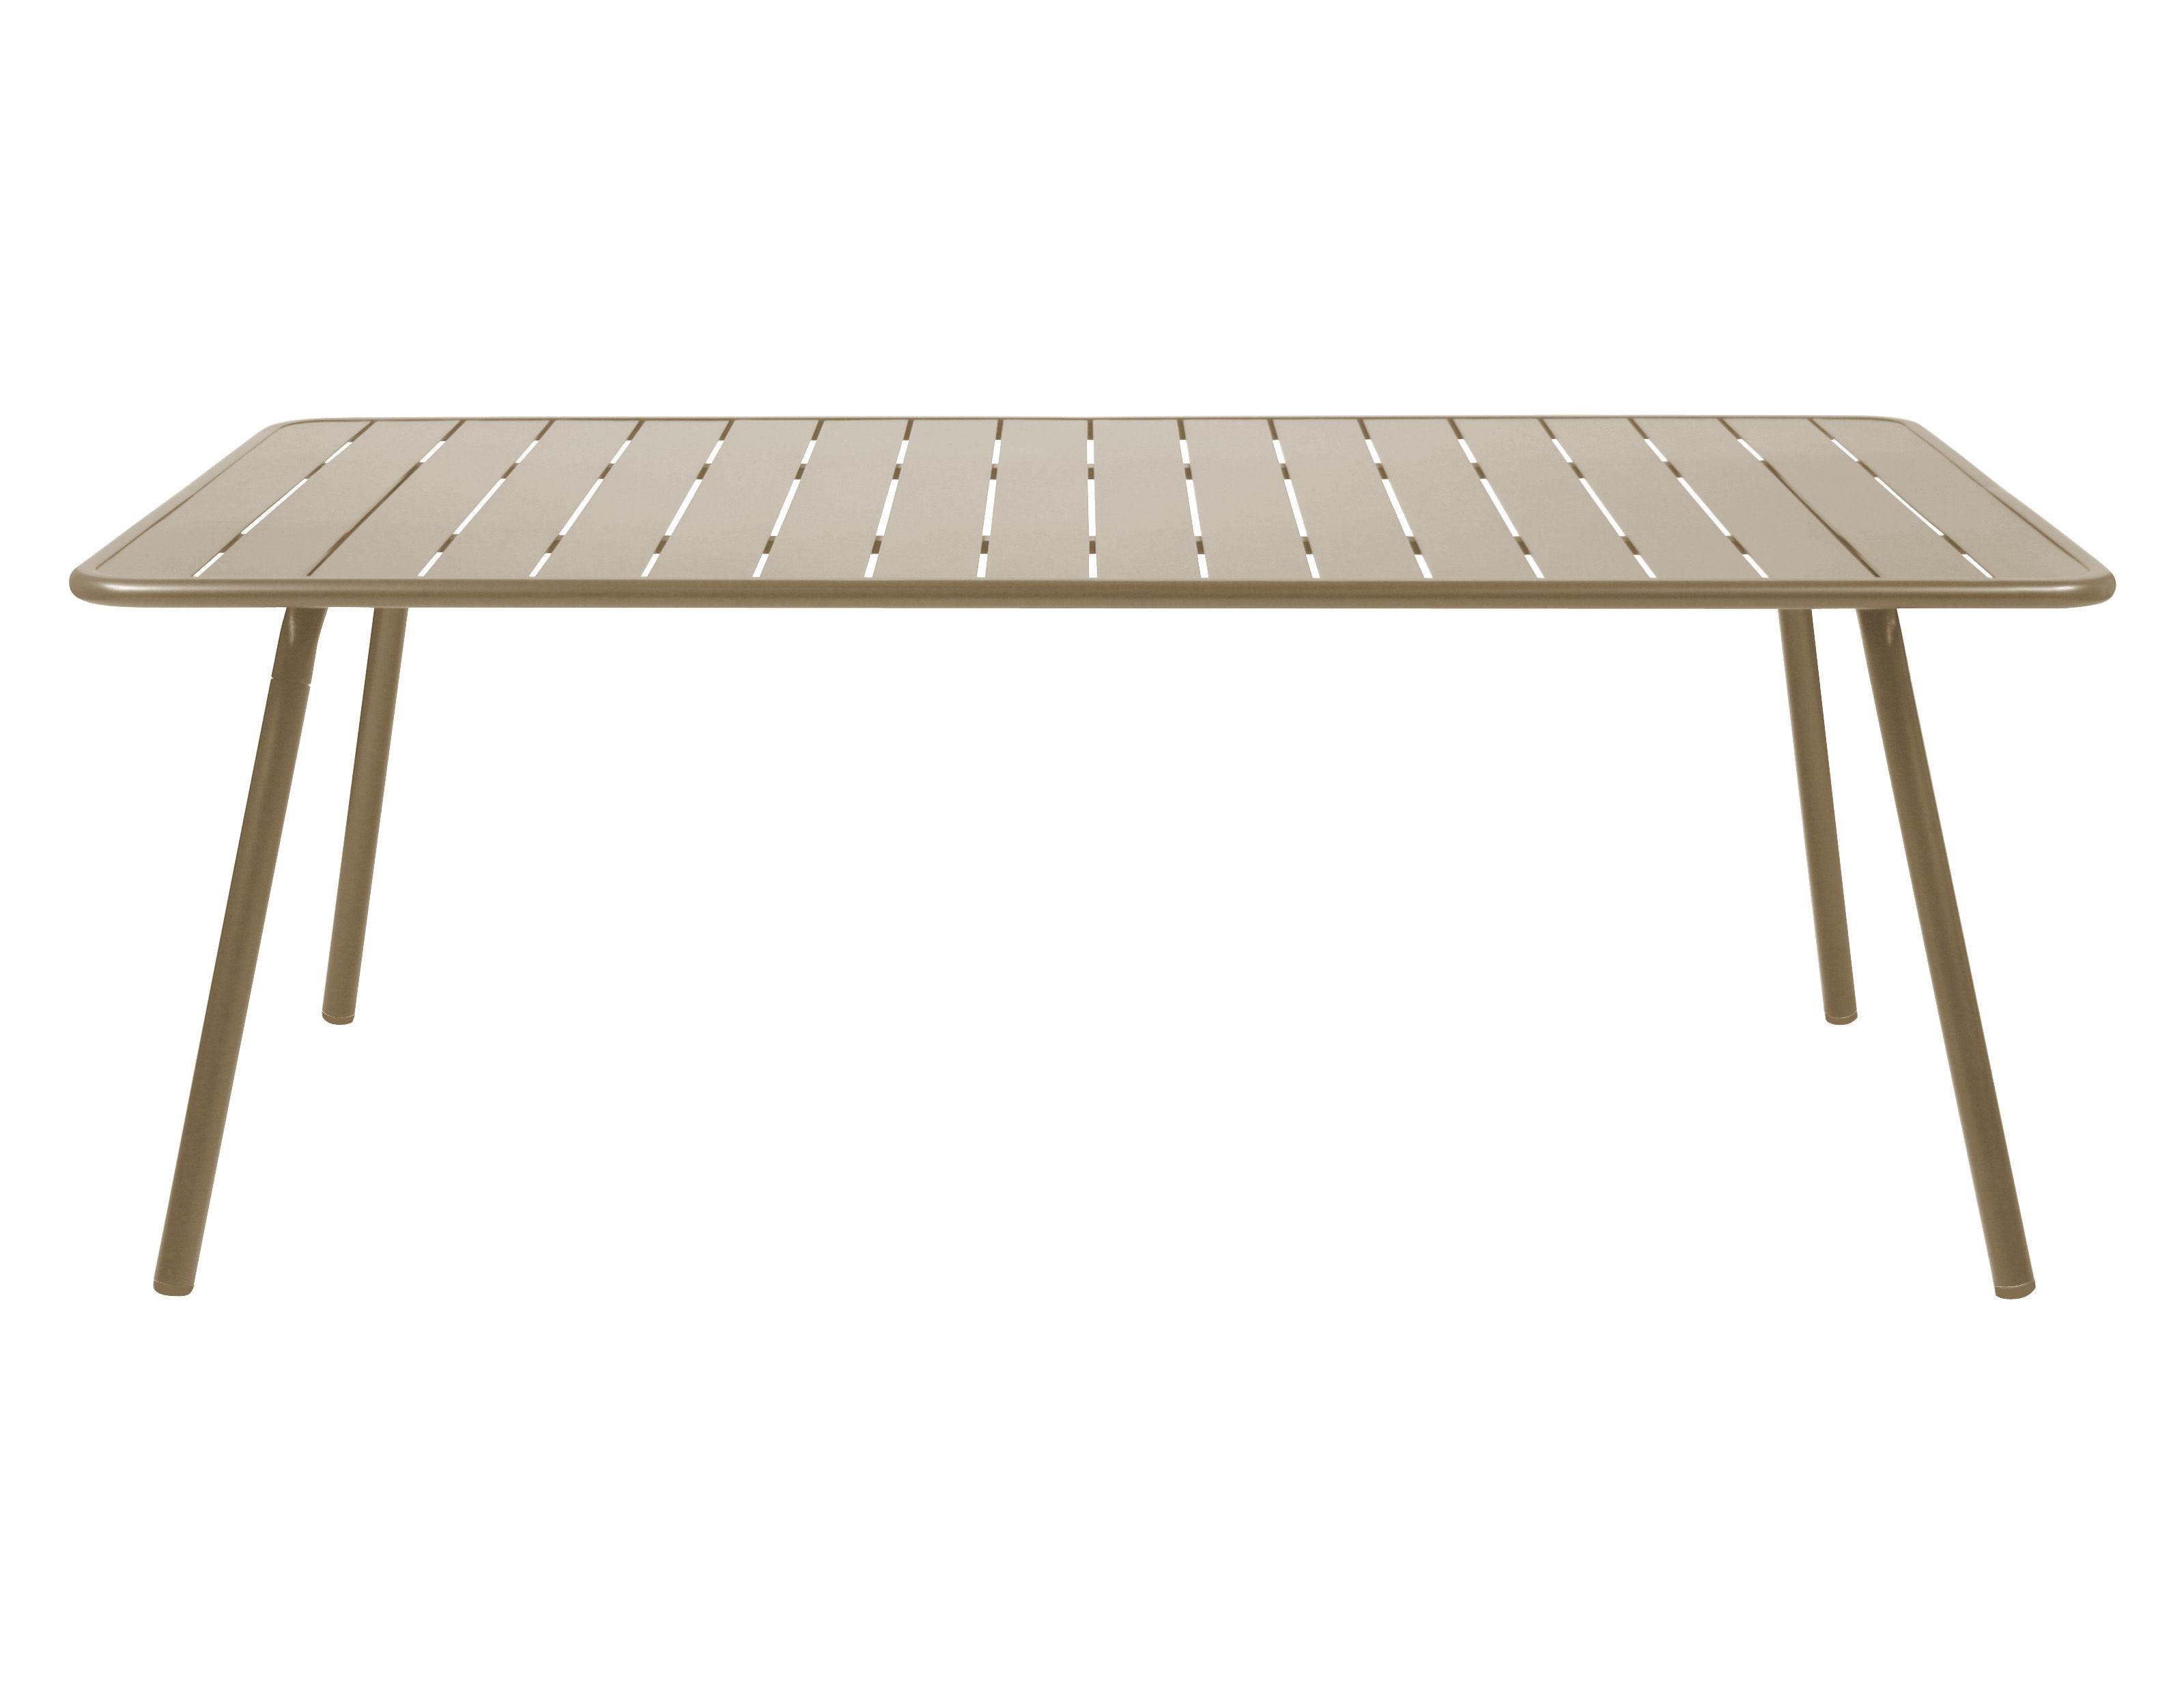 Outdoor - Tische - Luxembourg rechteckiger Tisch rechteckig - 8 Personen - L 207 cm - Fermob - Muskat - lackiertes Aluminium